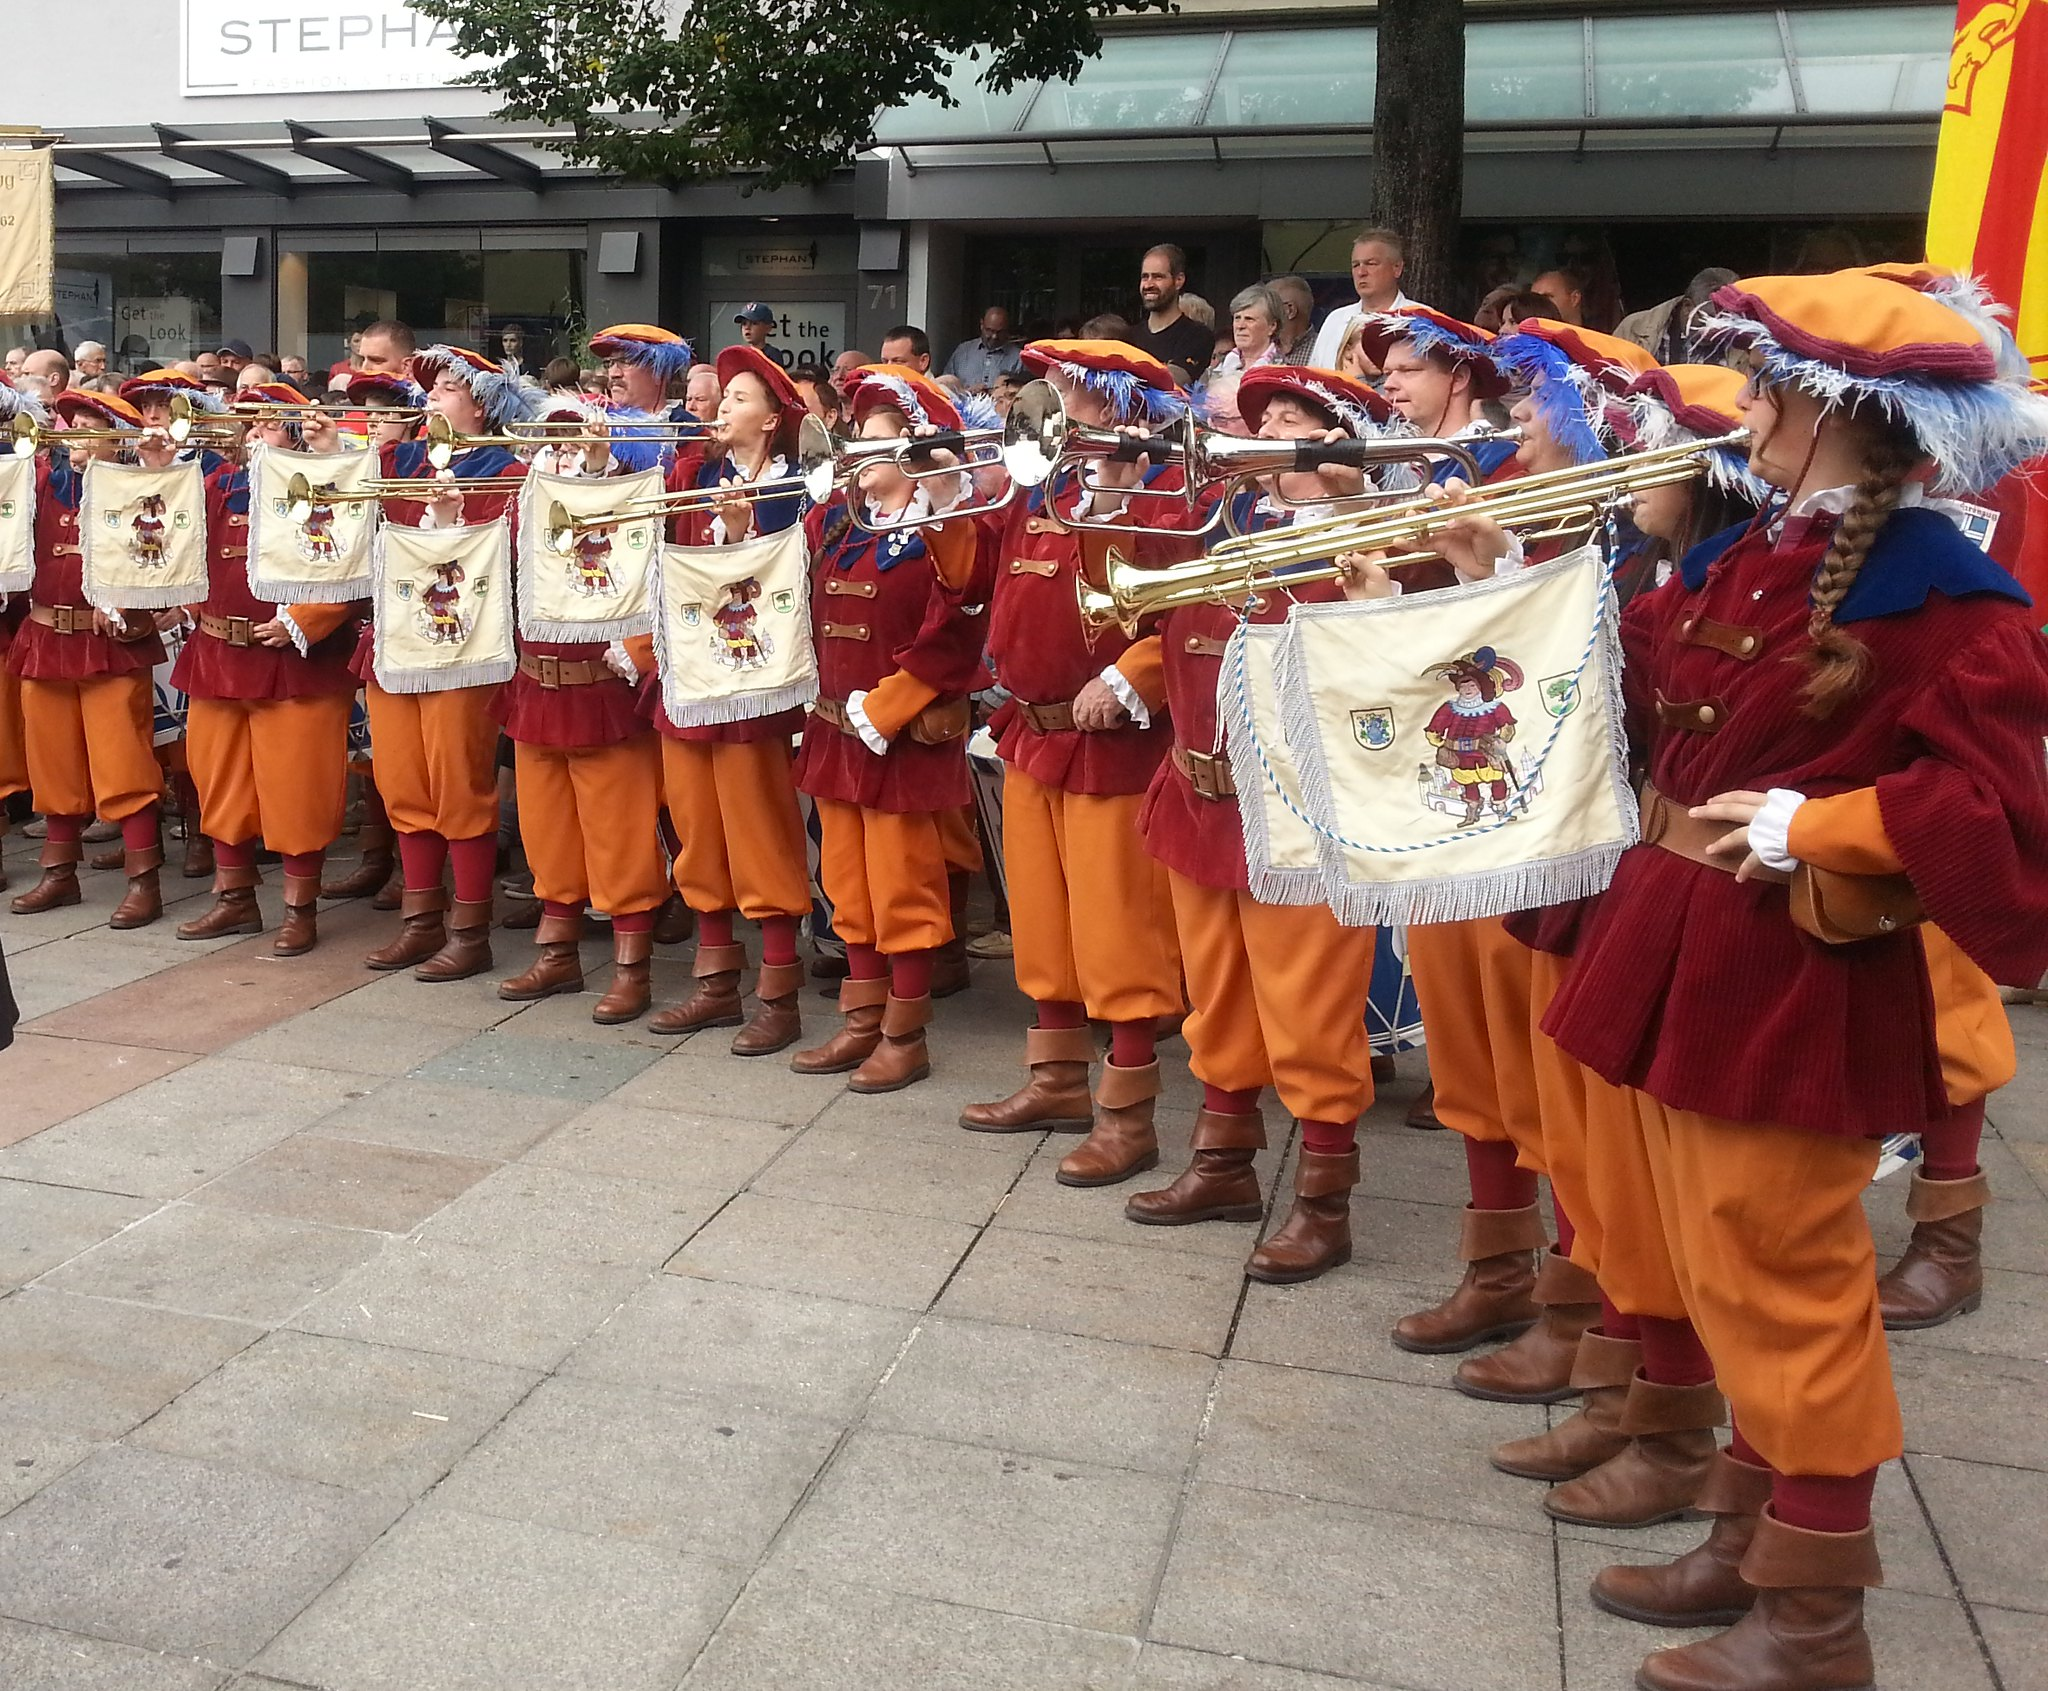 Landesfestumzug Bruchsal 2015 (20)